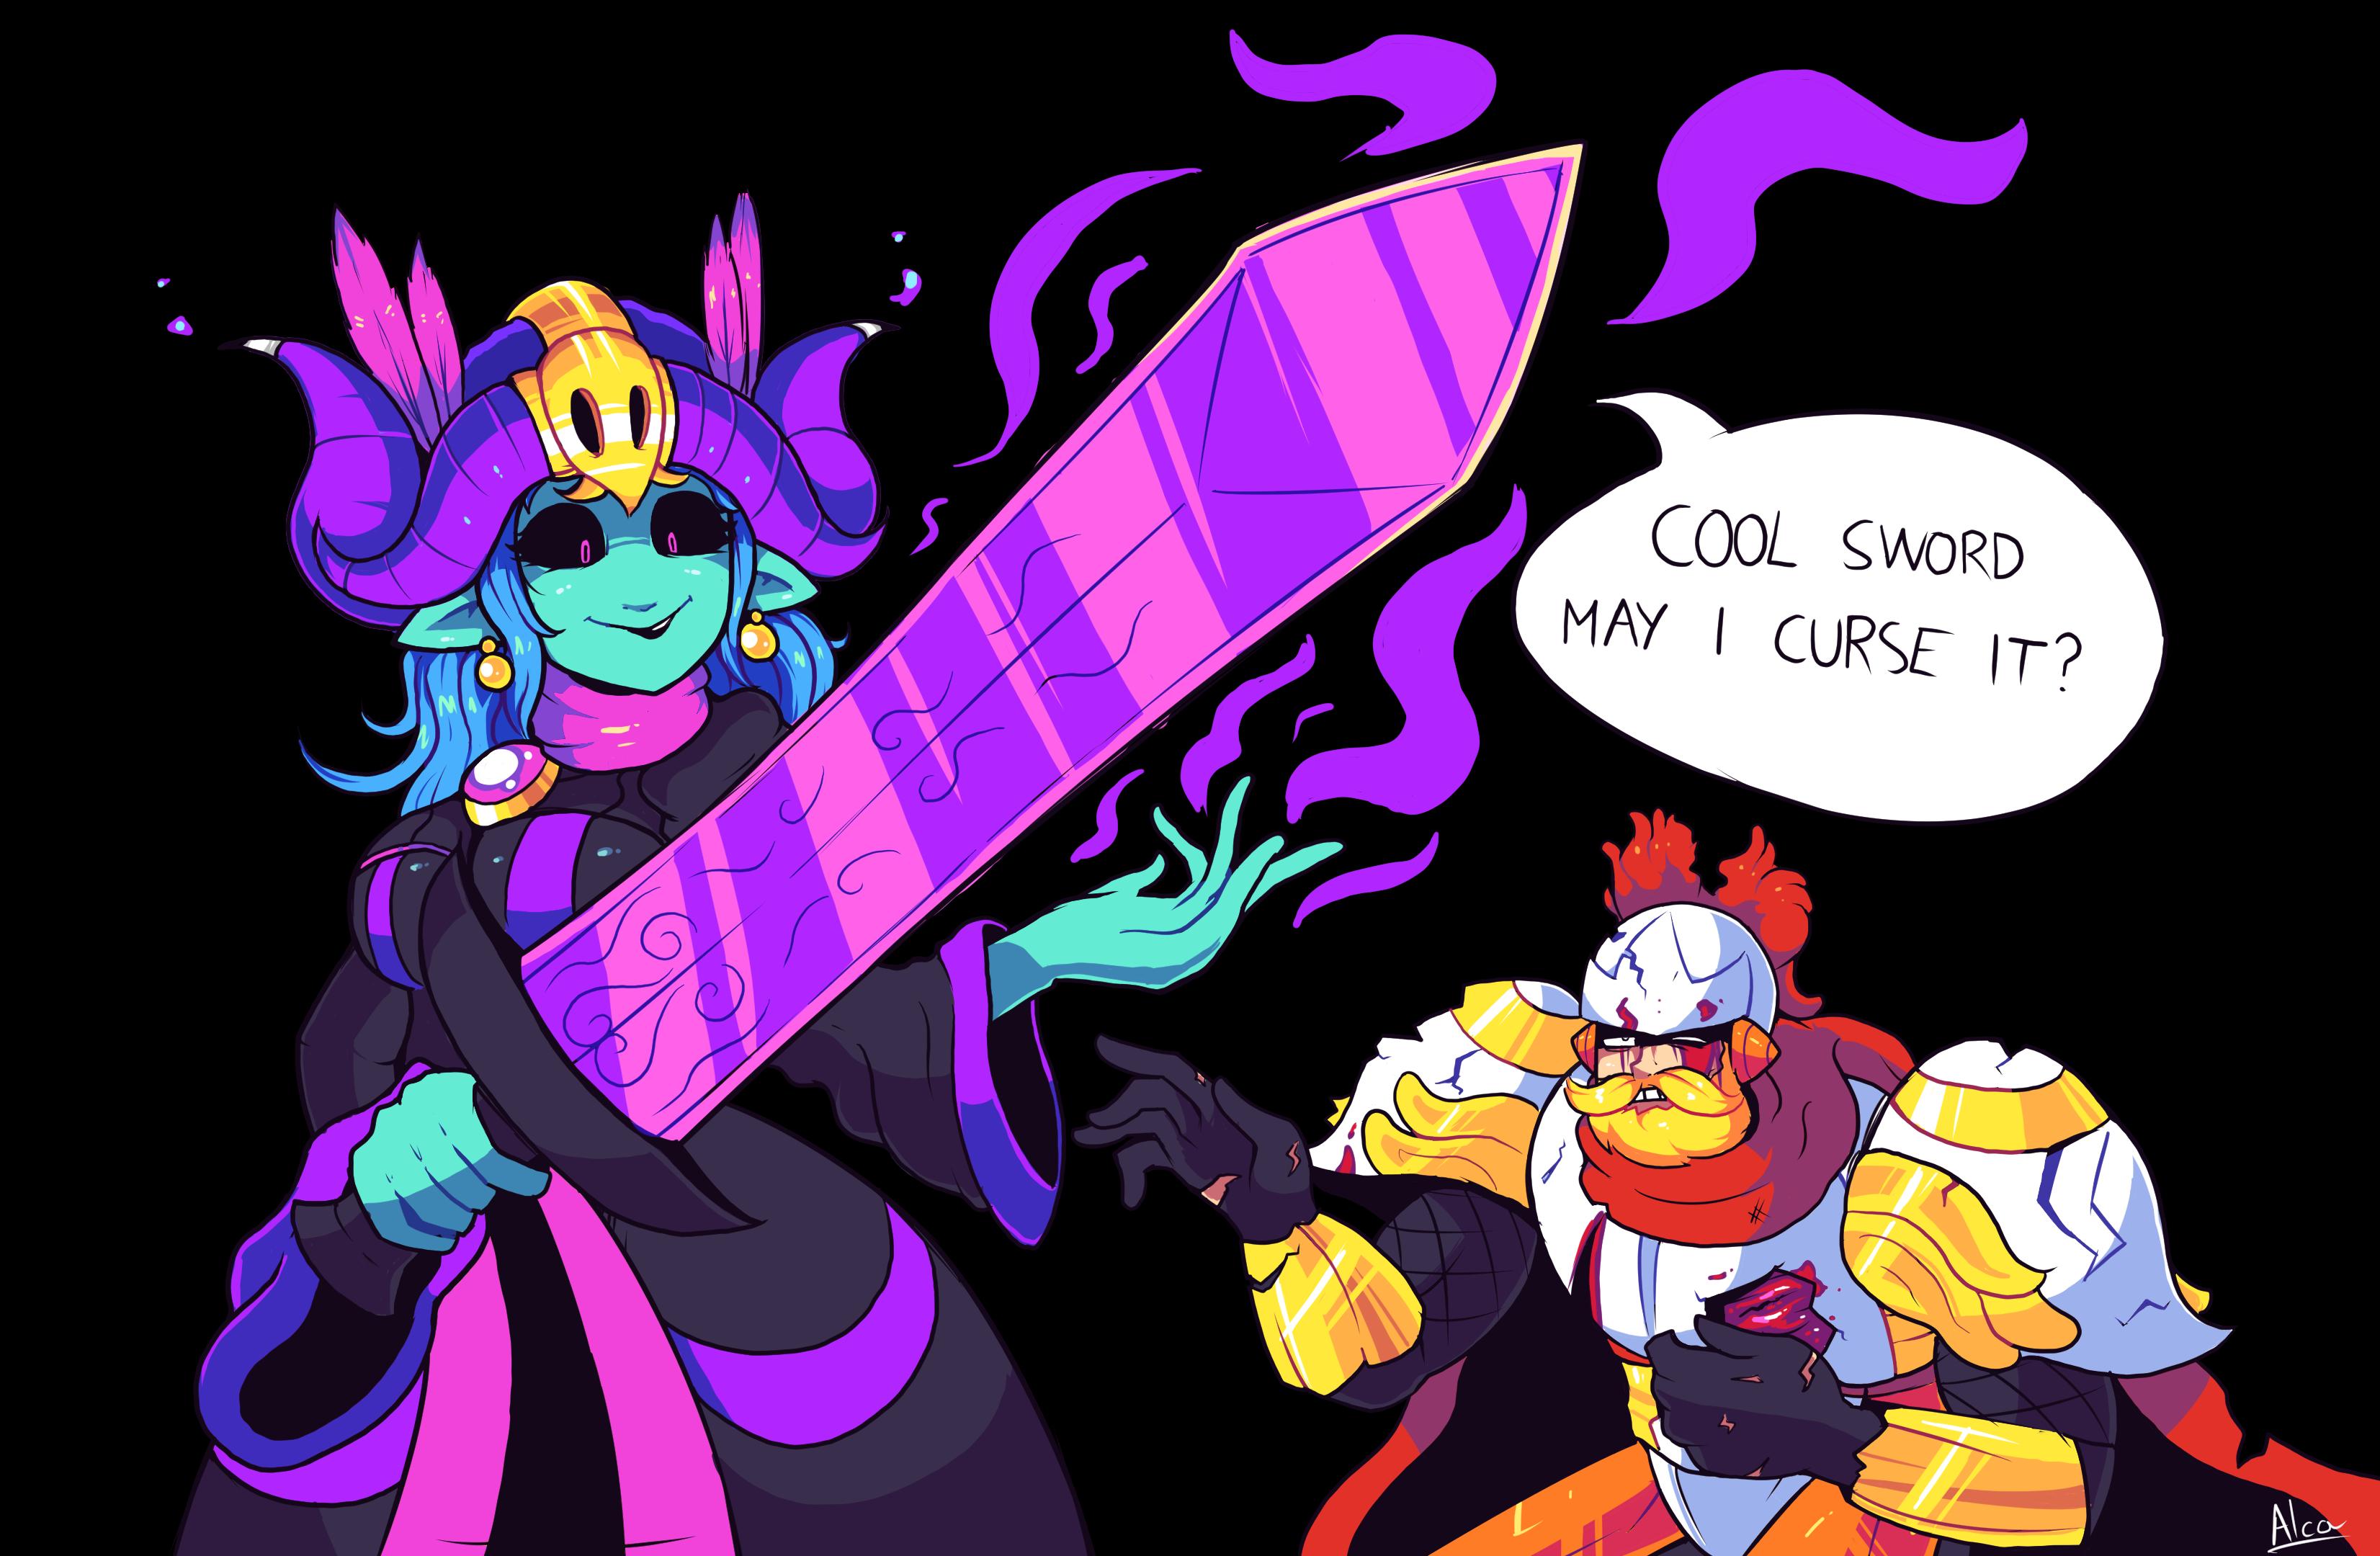 Knightober Day 2: Cursed Sword